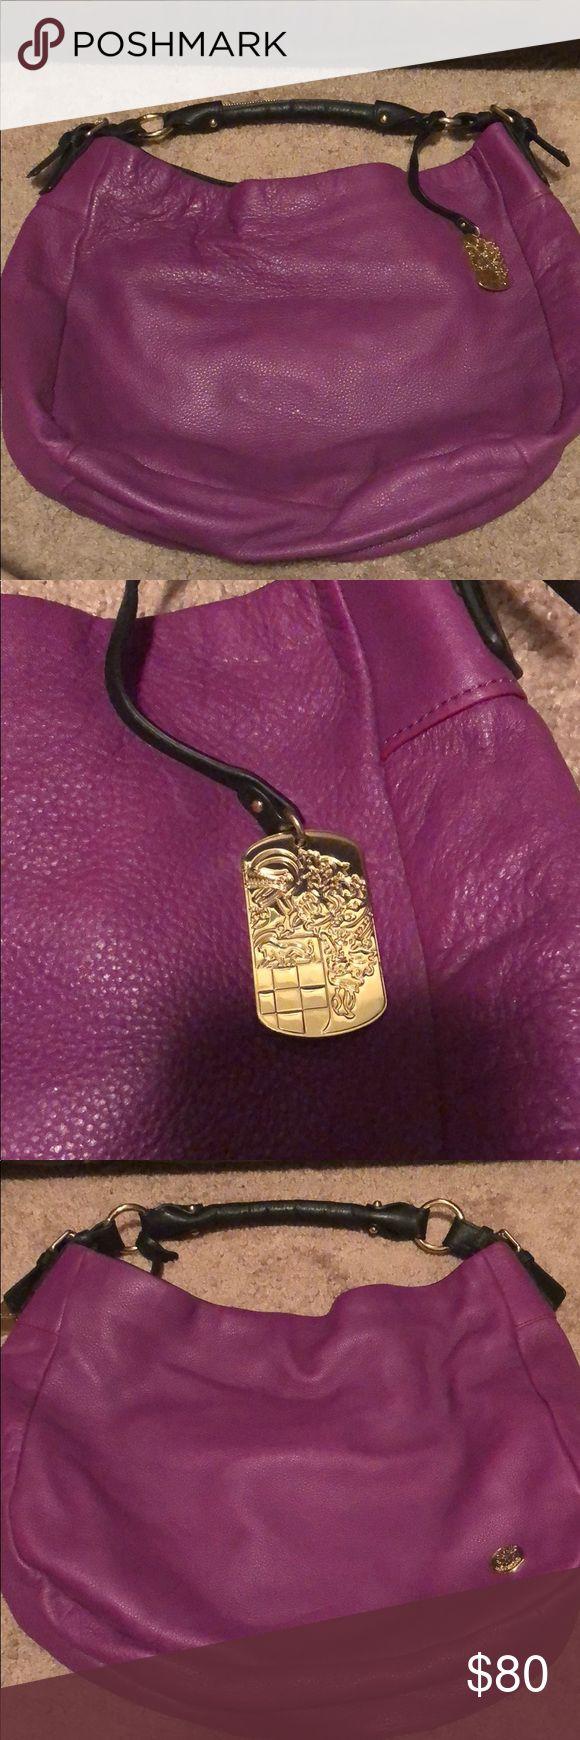 Purple Vince camuto hobo shoulder bag NWOT Purple Vince camuto hobo shoulder bag  Never used. NWOT Vince Camuto Bags Hobos